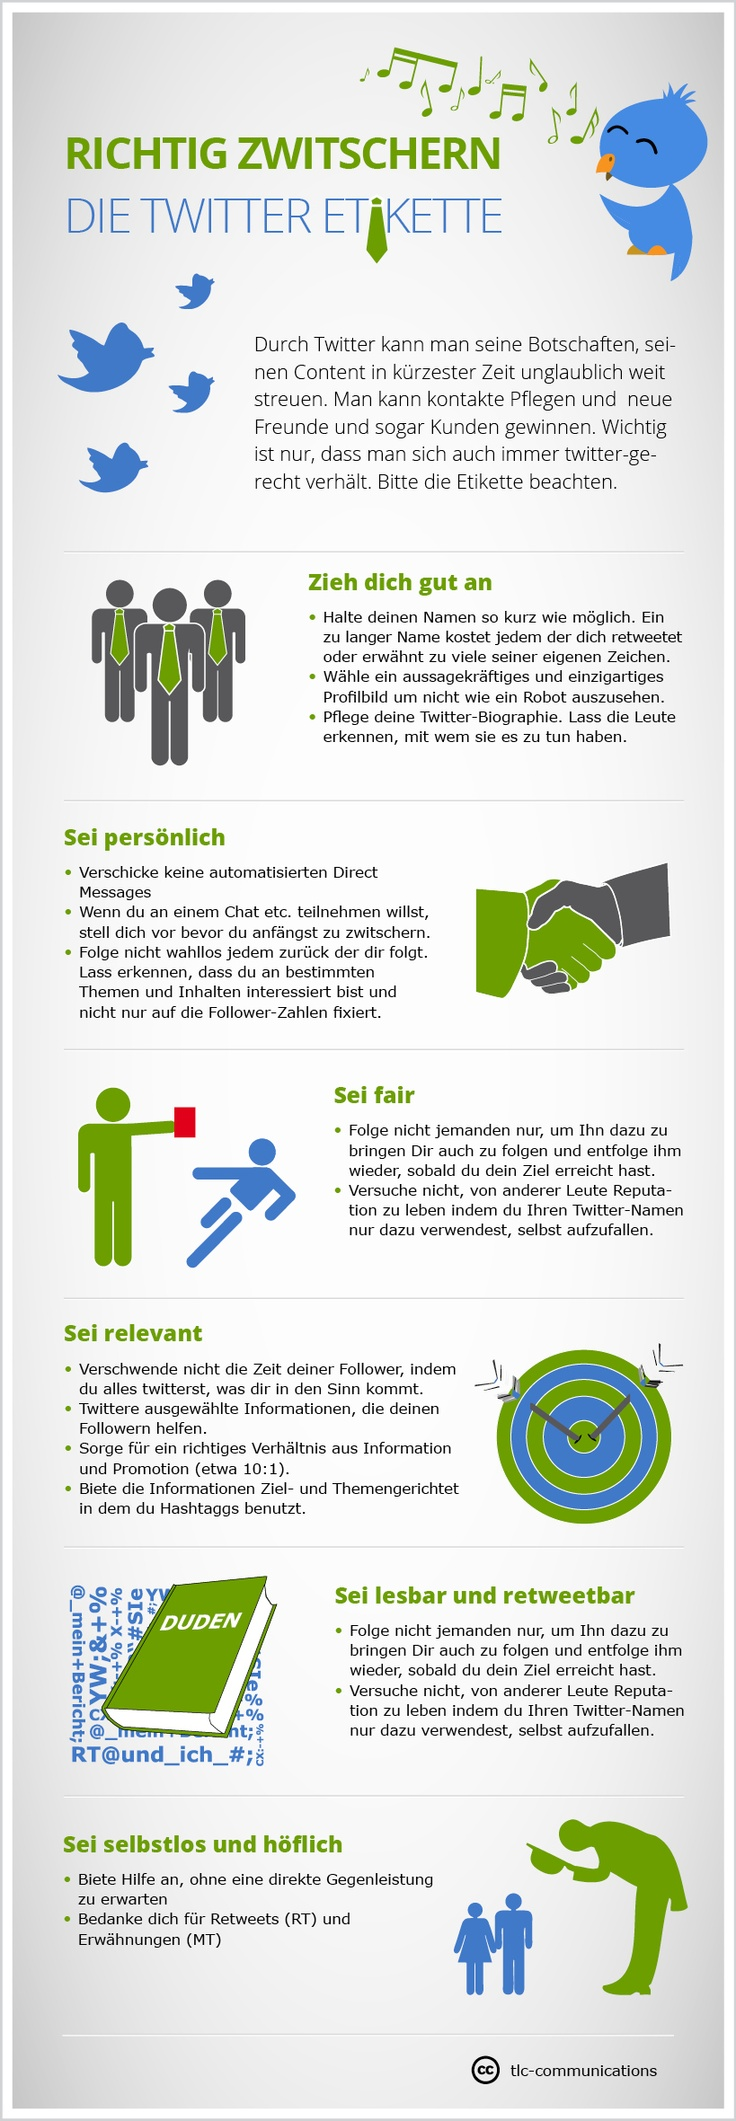 #Infografik Twitter-Etikette.